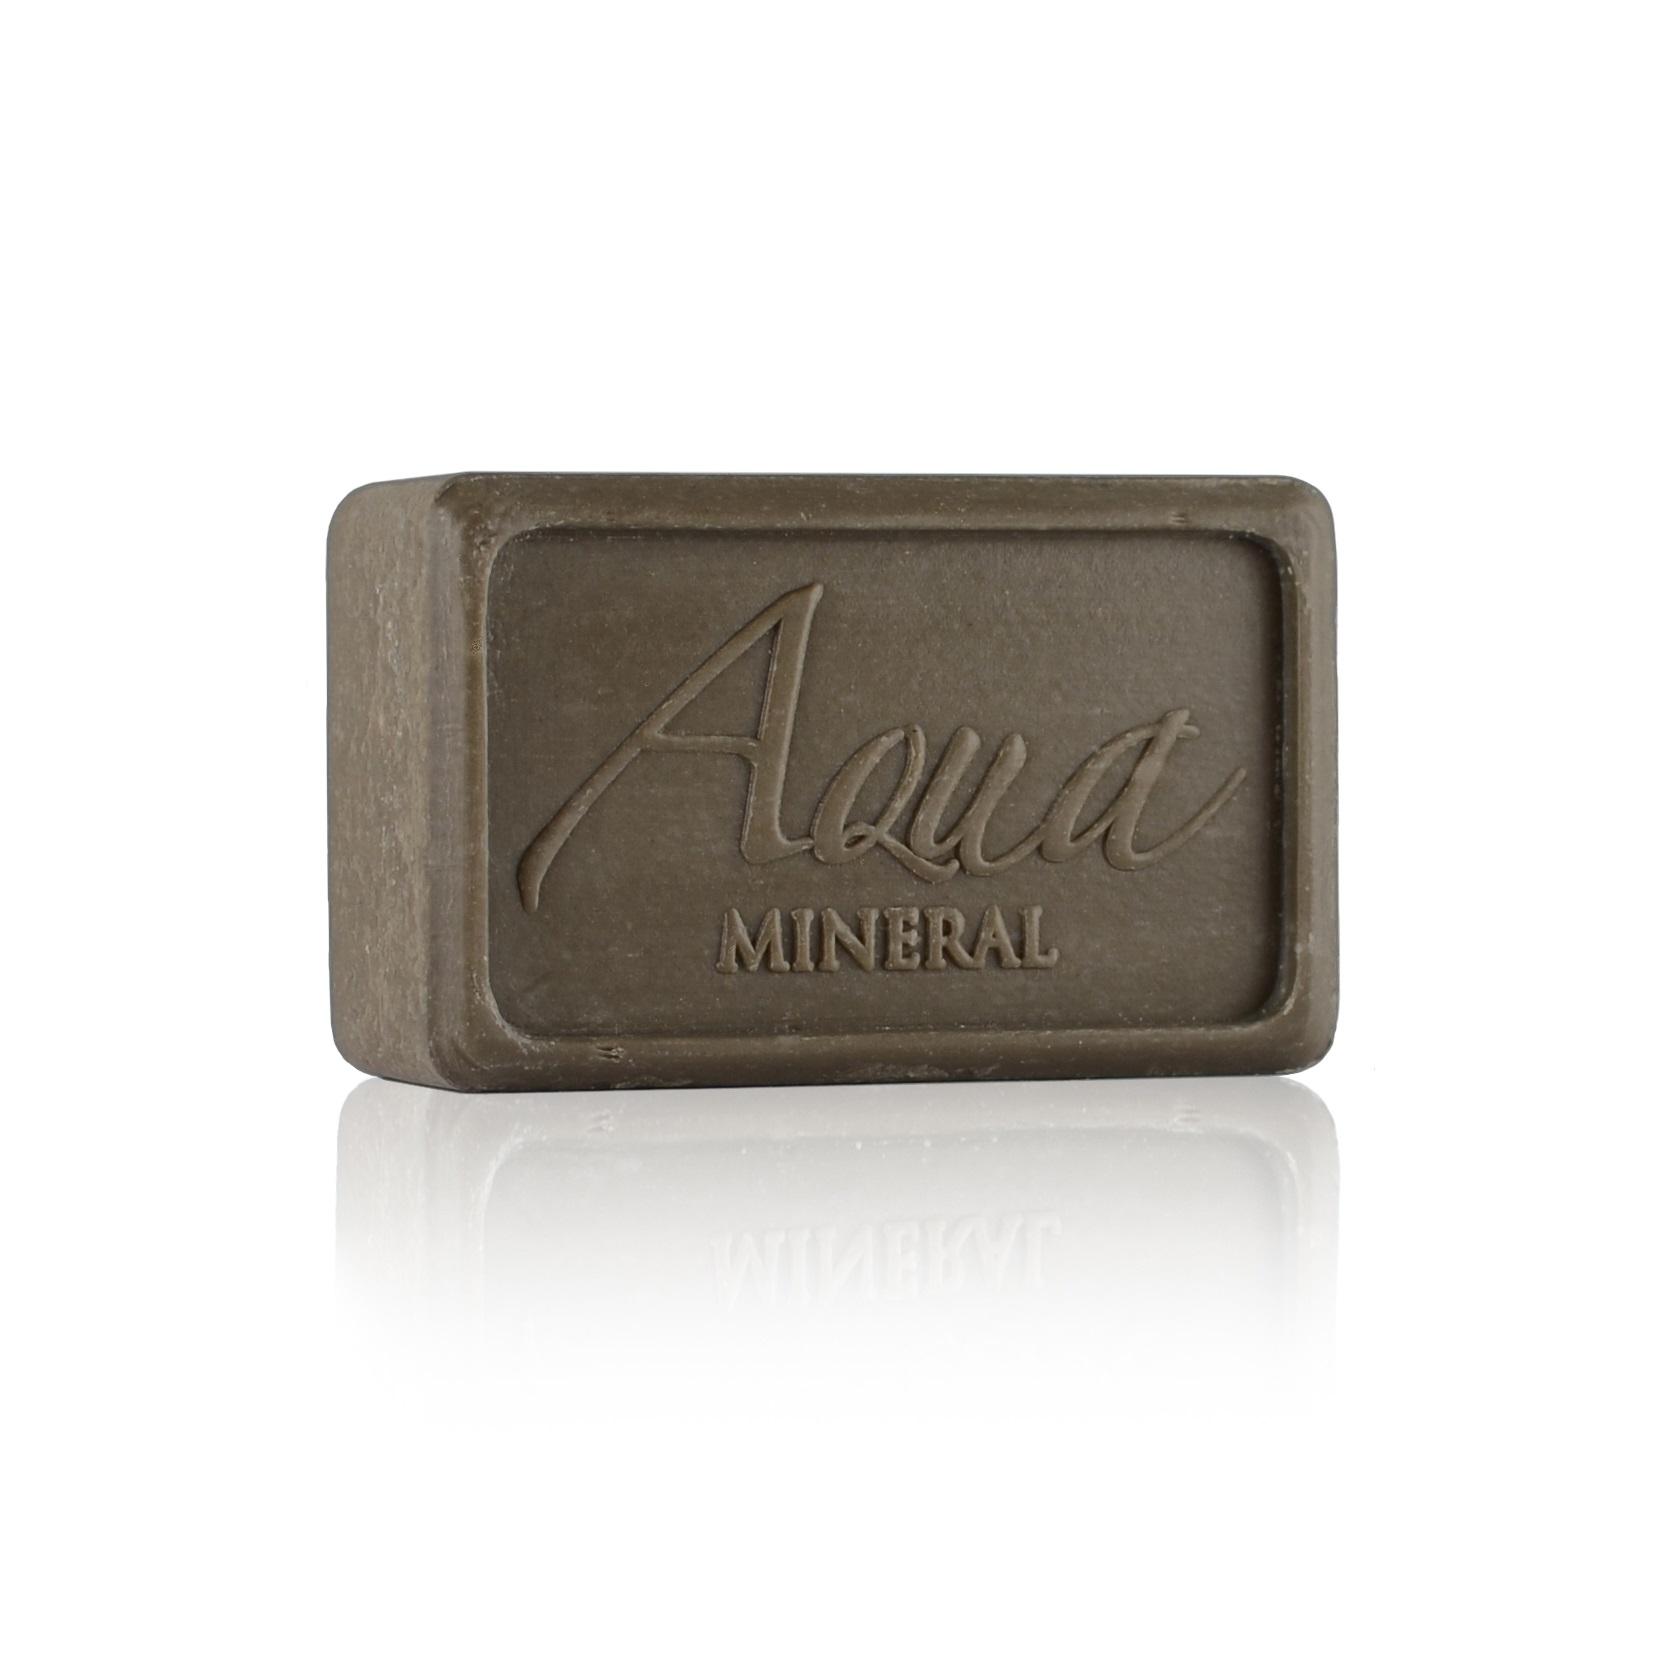 Aqua Mineral Mud Soap - mýdlo s černým bahnem